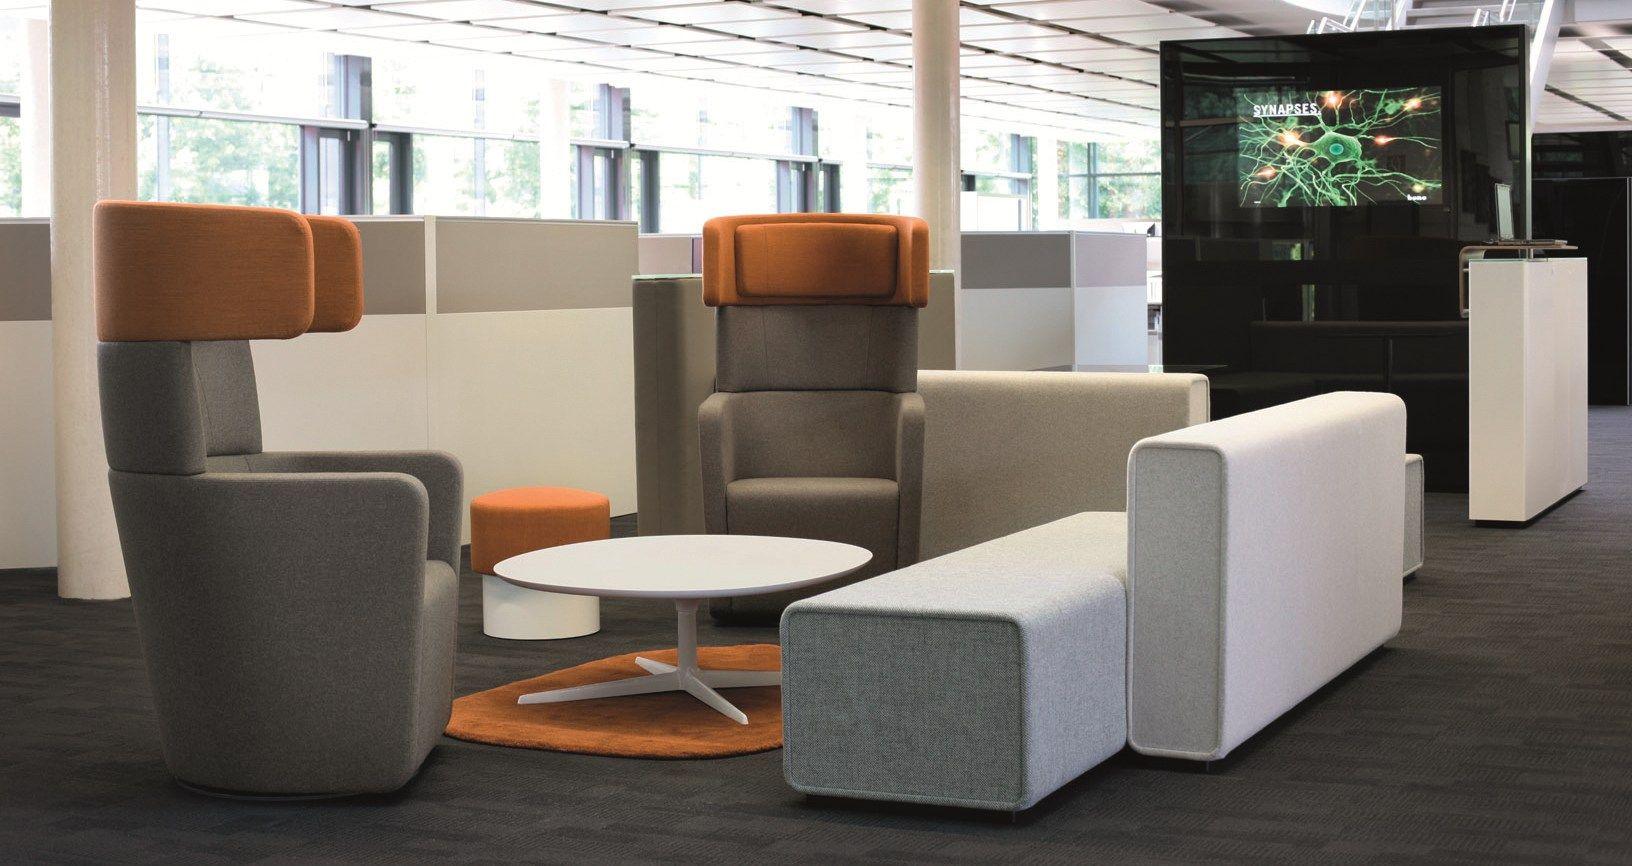 ohrensessel mit hoher r ckenlehne f r hotel gastro parcs wing chair by bene design pearsonlloyd. Black Bedroom Furniture Sets. Home Design Ideas